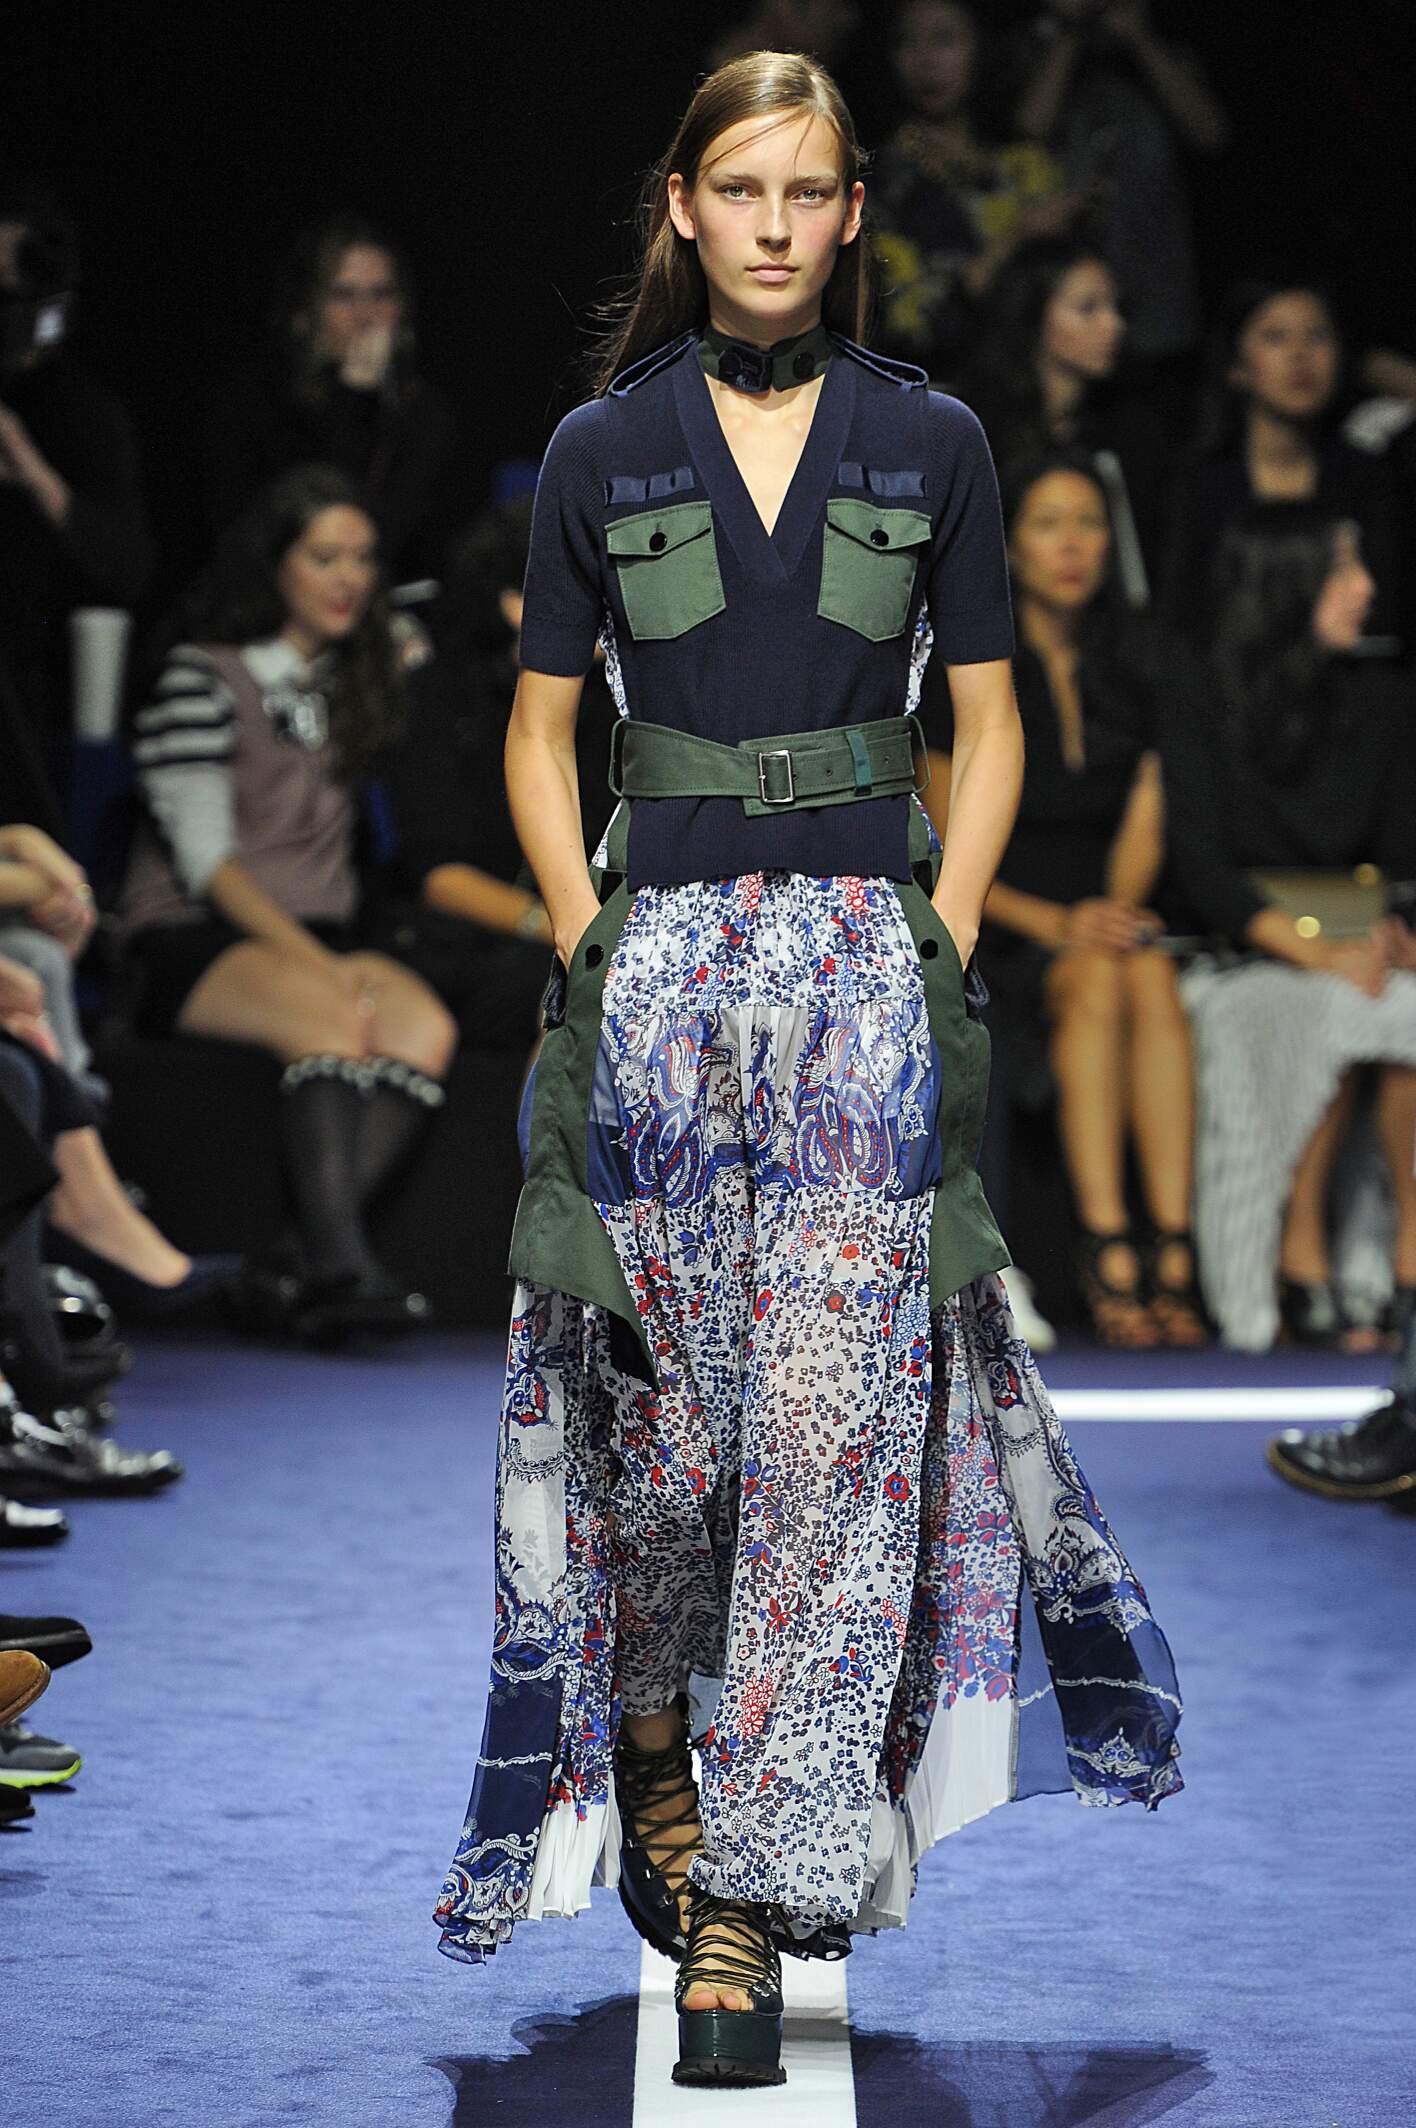 Spring 2015 Woman Fashion Show Sacai